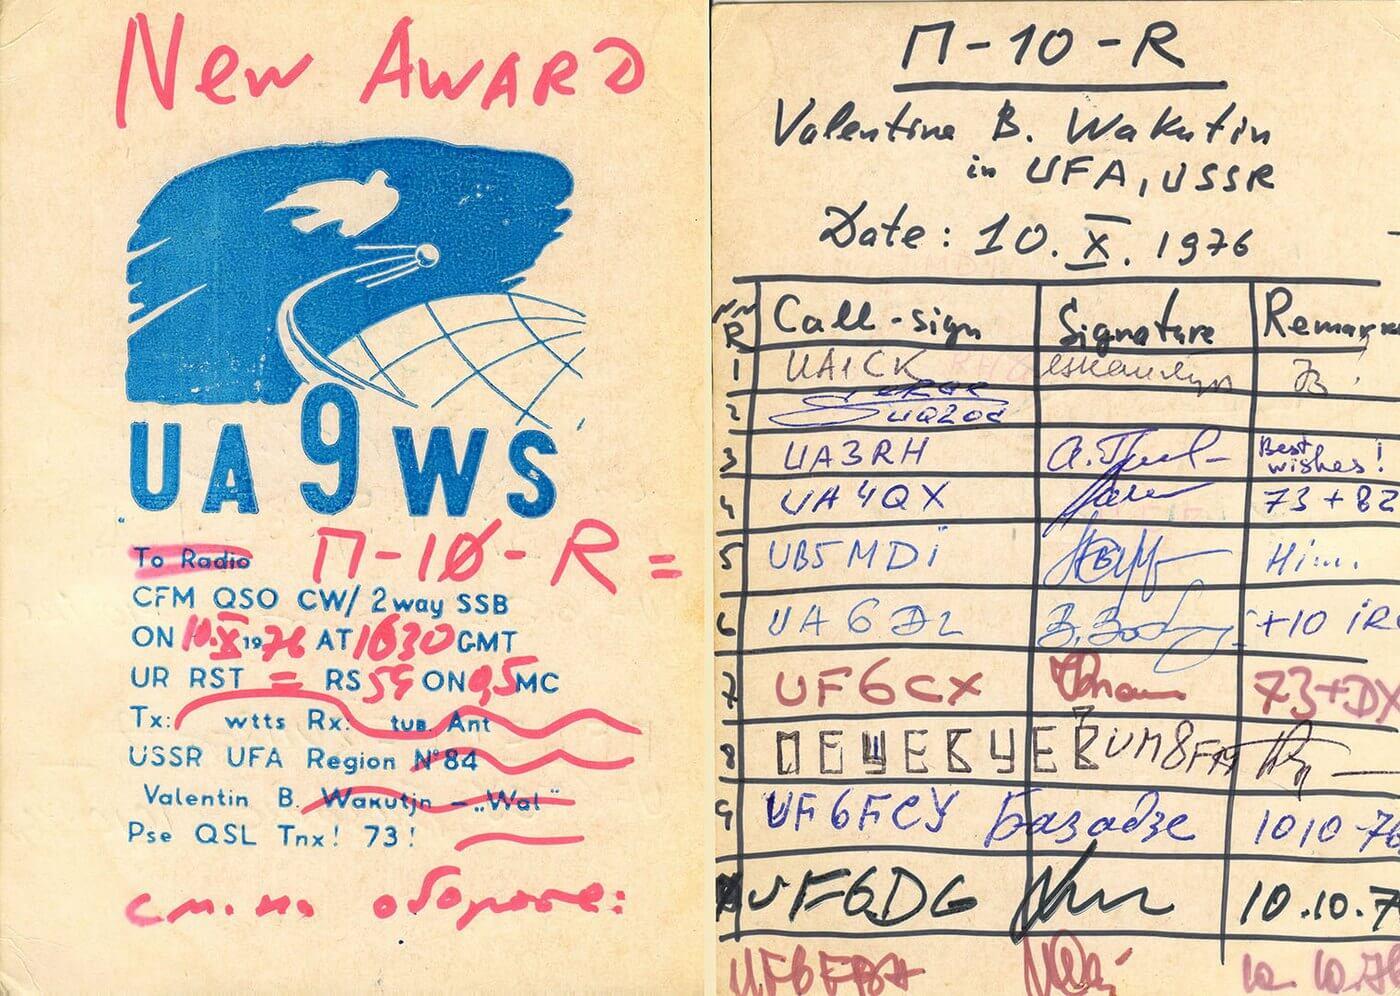 Нажмите на изображение для увеличения.  Название:UA9WS-QSL-1976.jpg Просмотров:9 Размер:236.2 Кб ID:193564